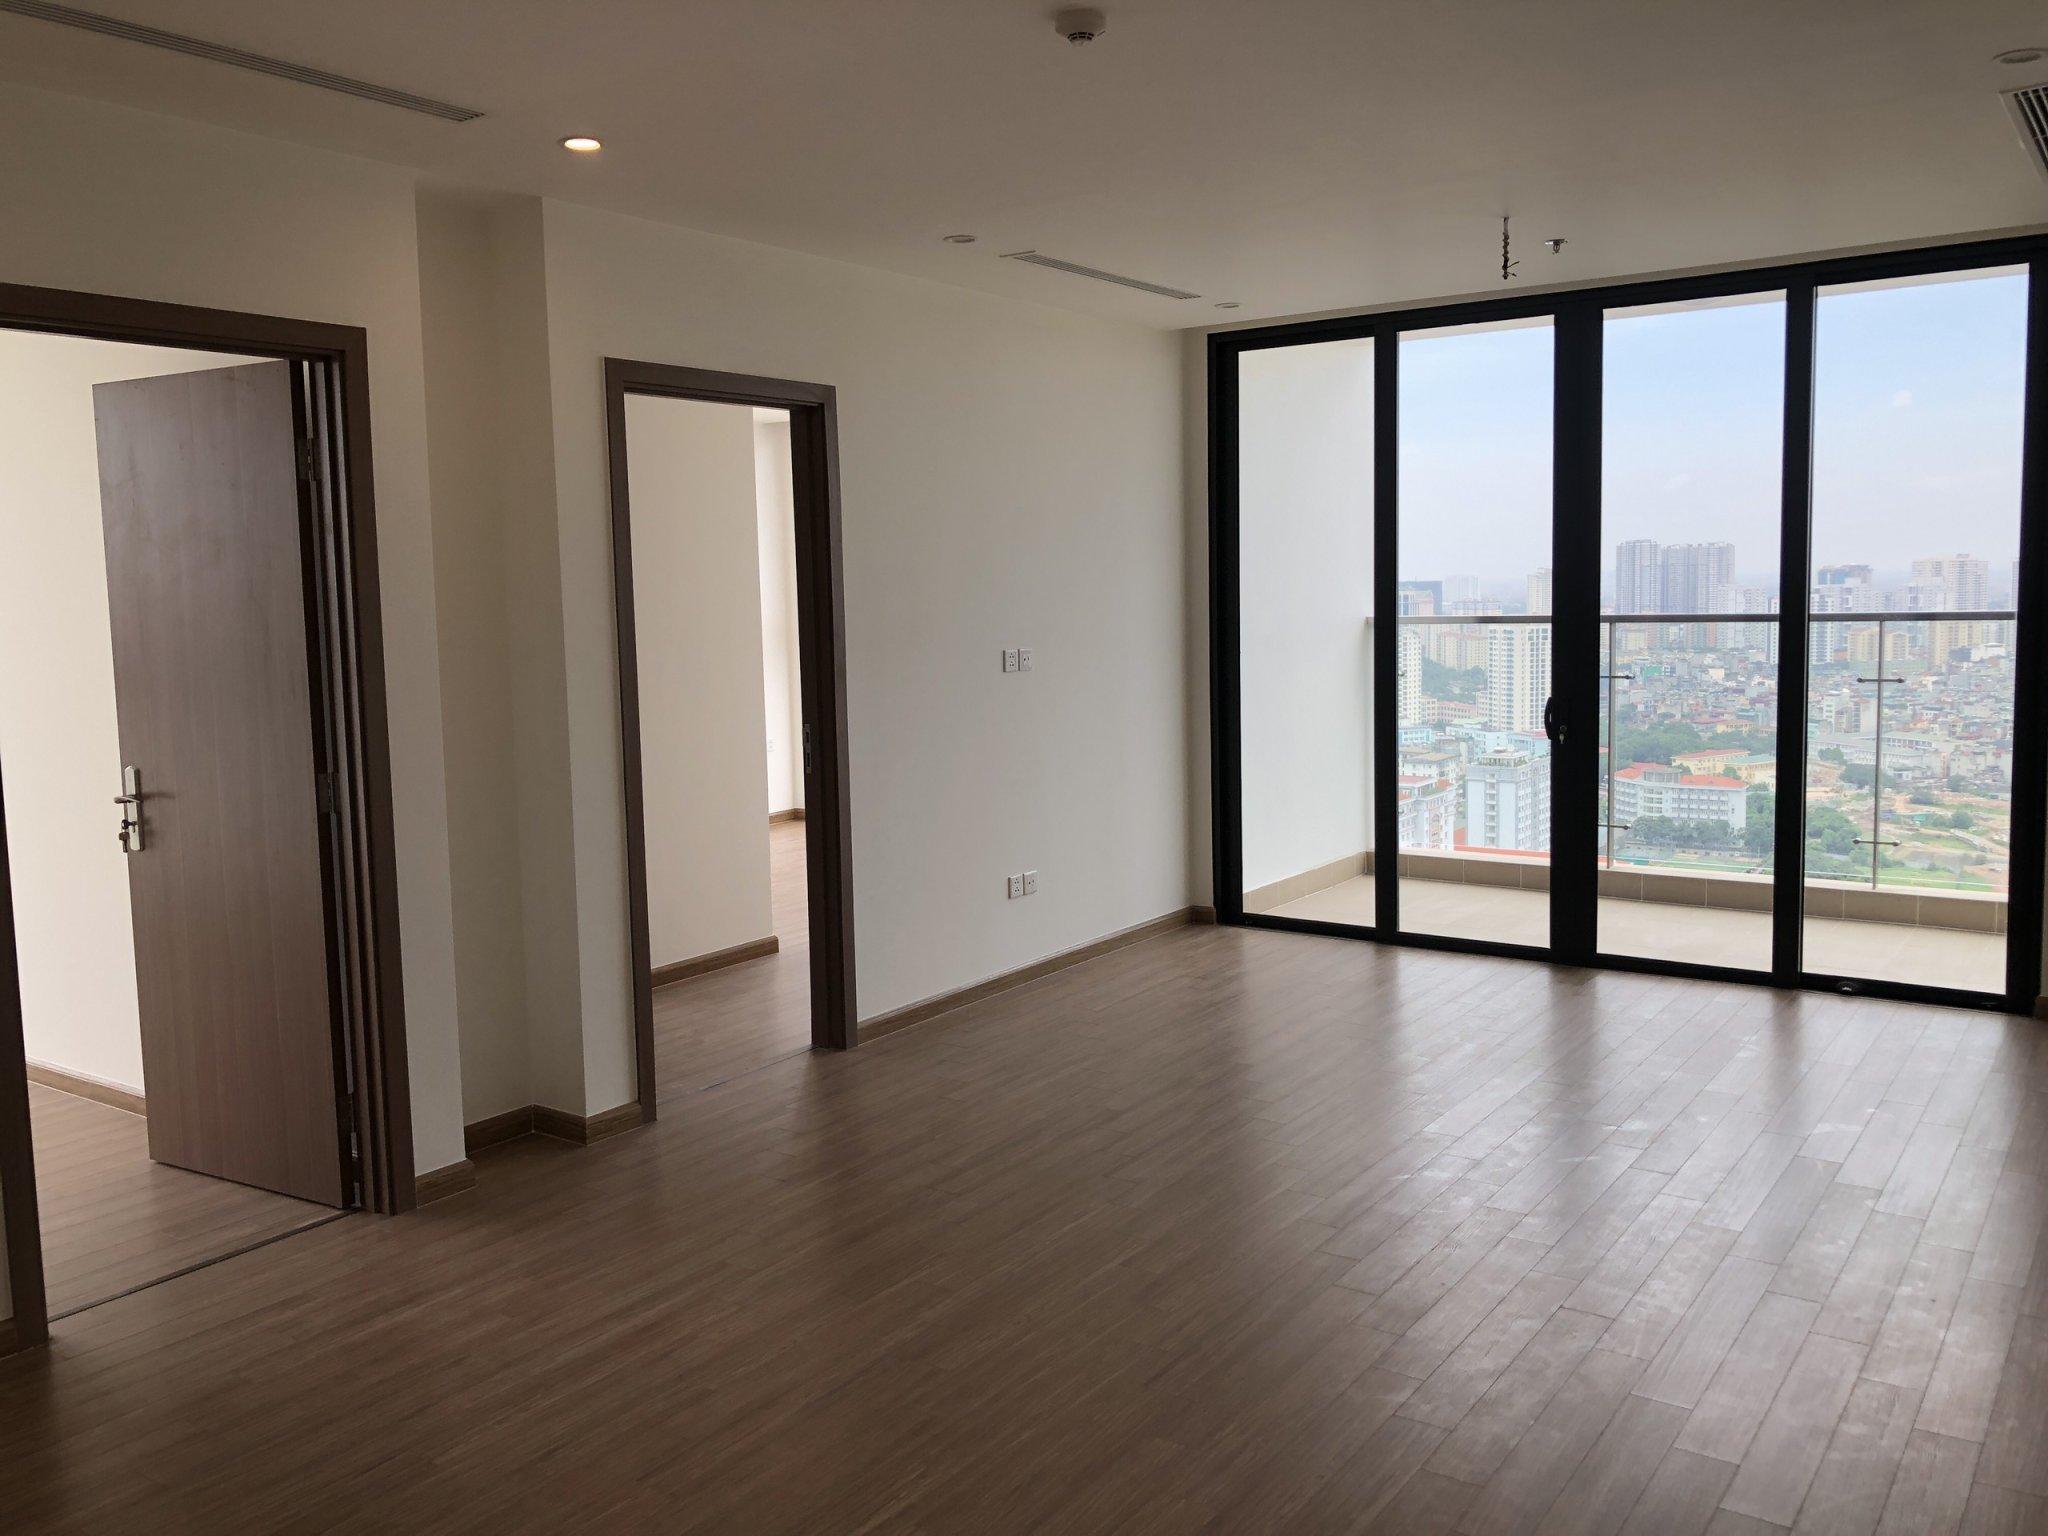 Vinhomes Skylake Pham Hung Apartment for rent